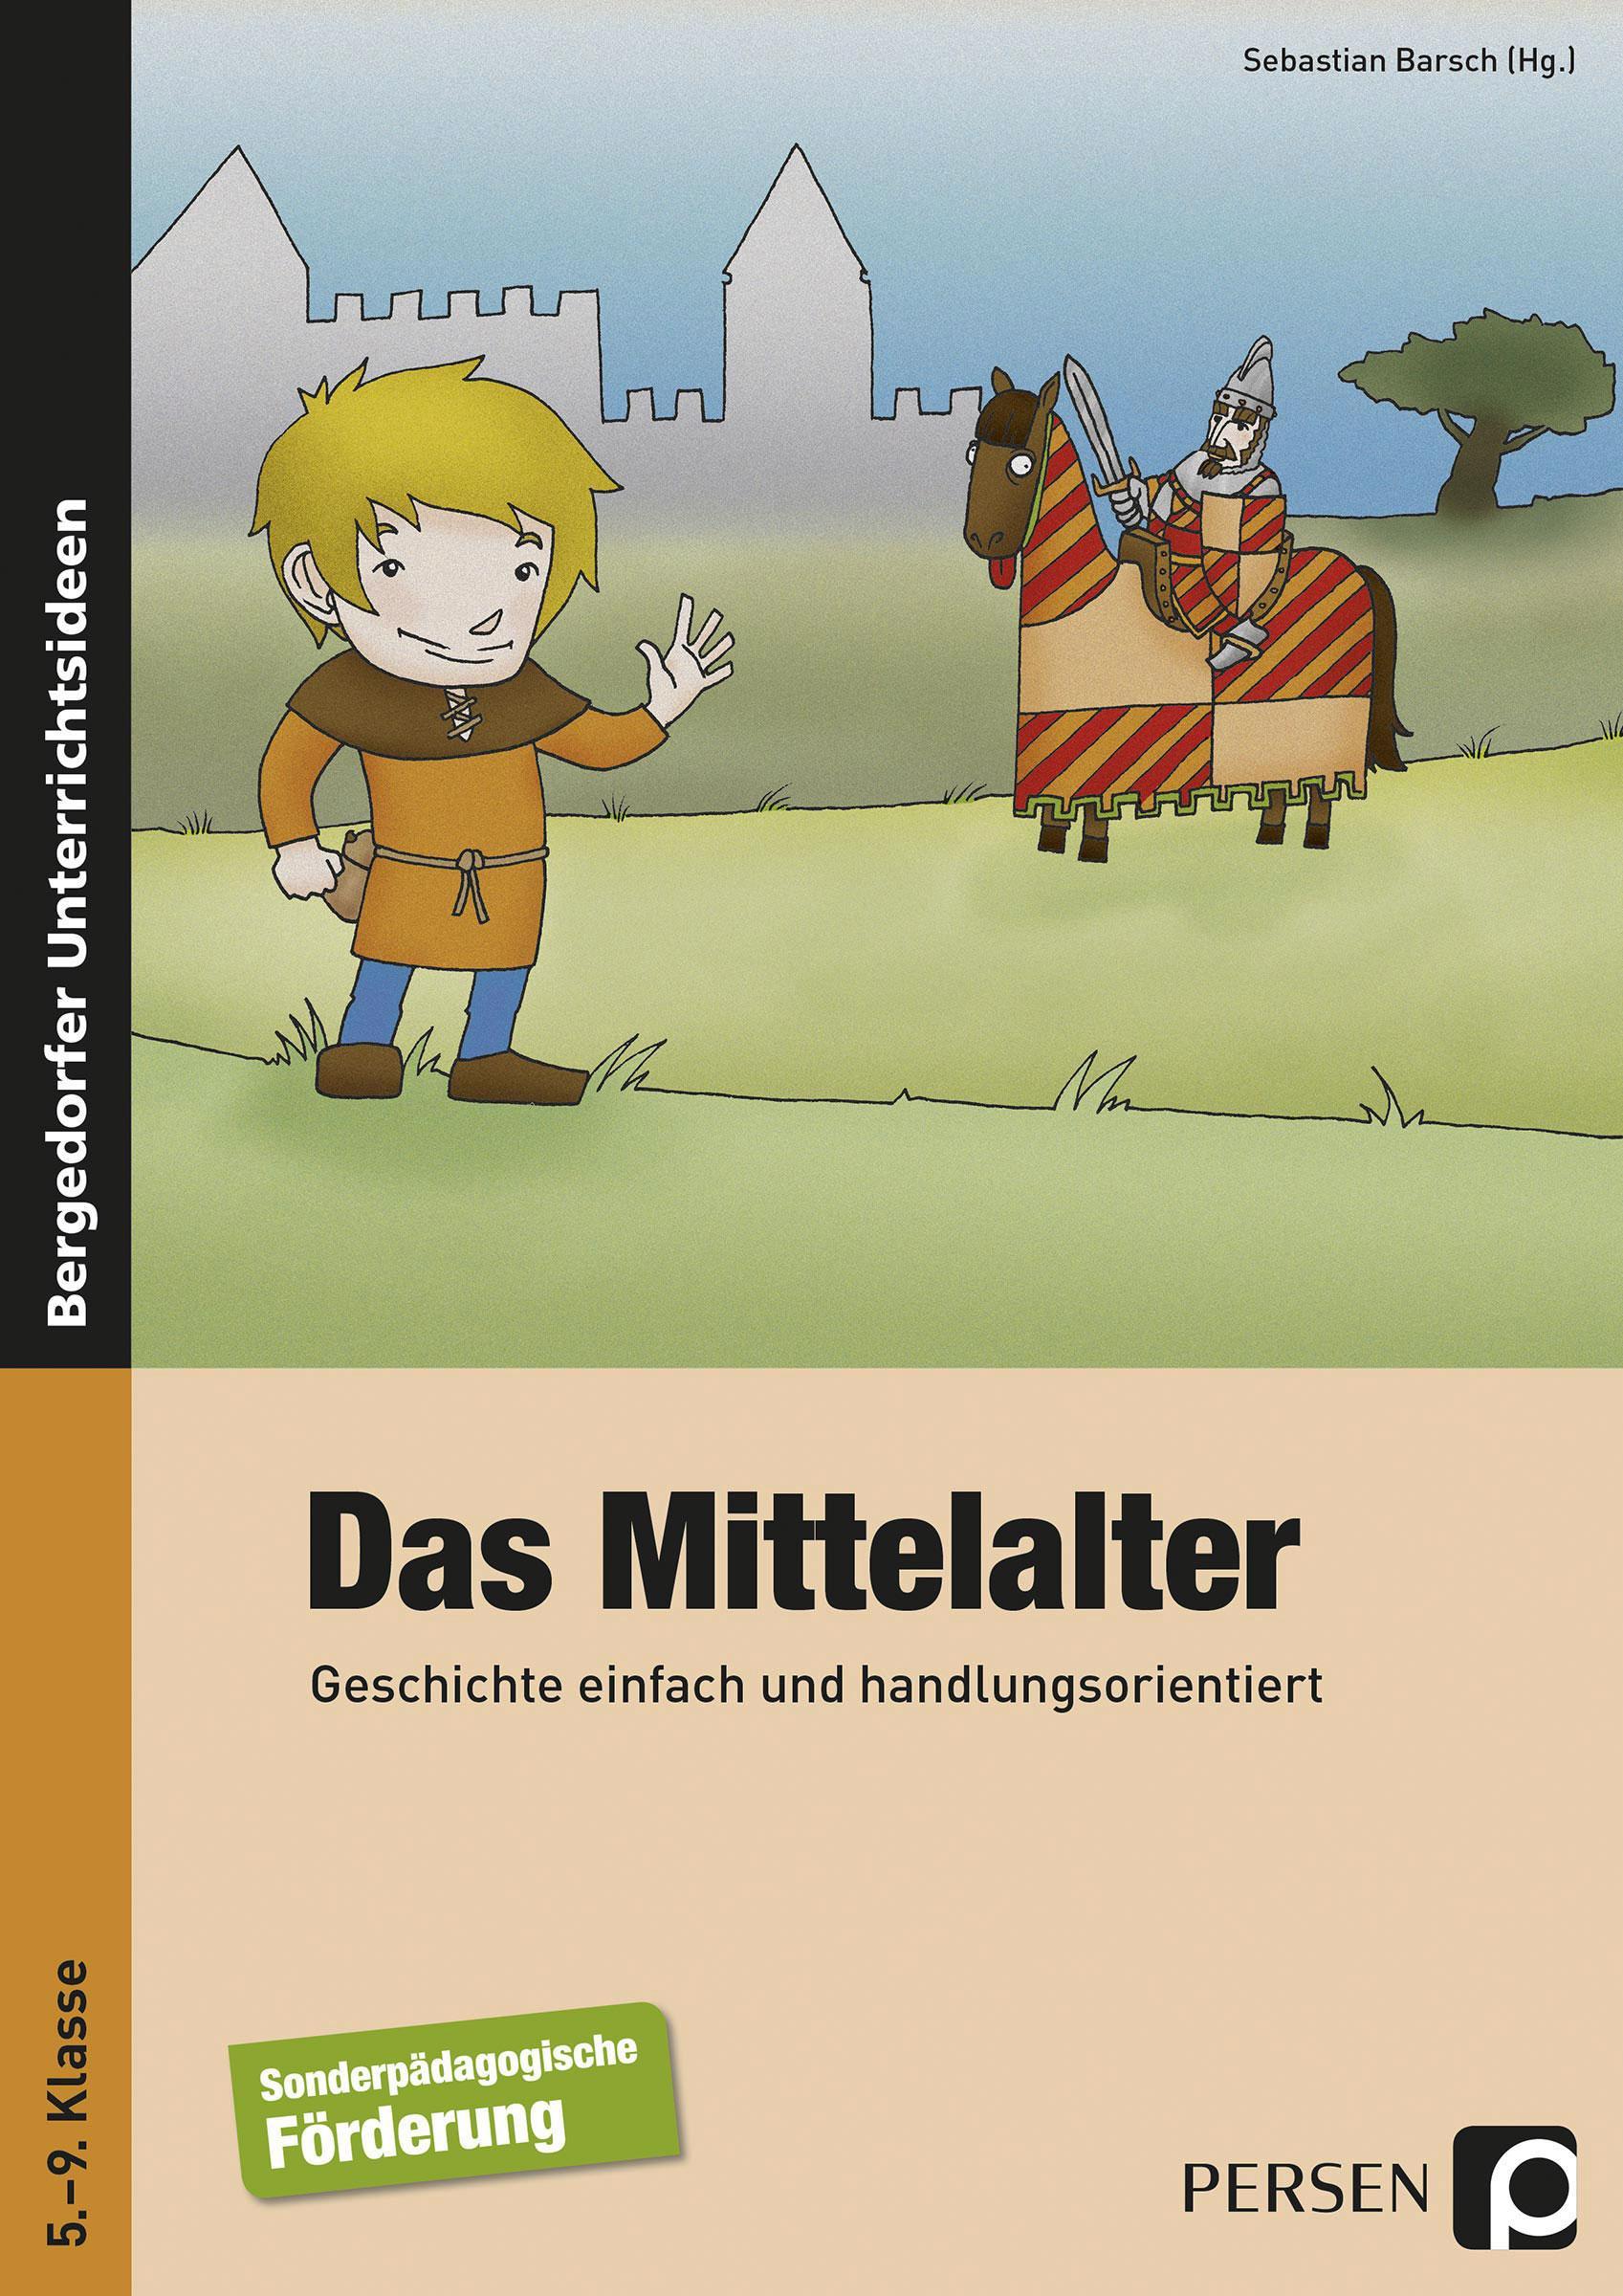 Das Mittelalter, Sebastian Barsch